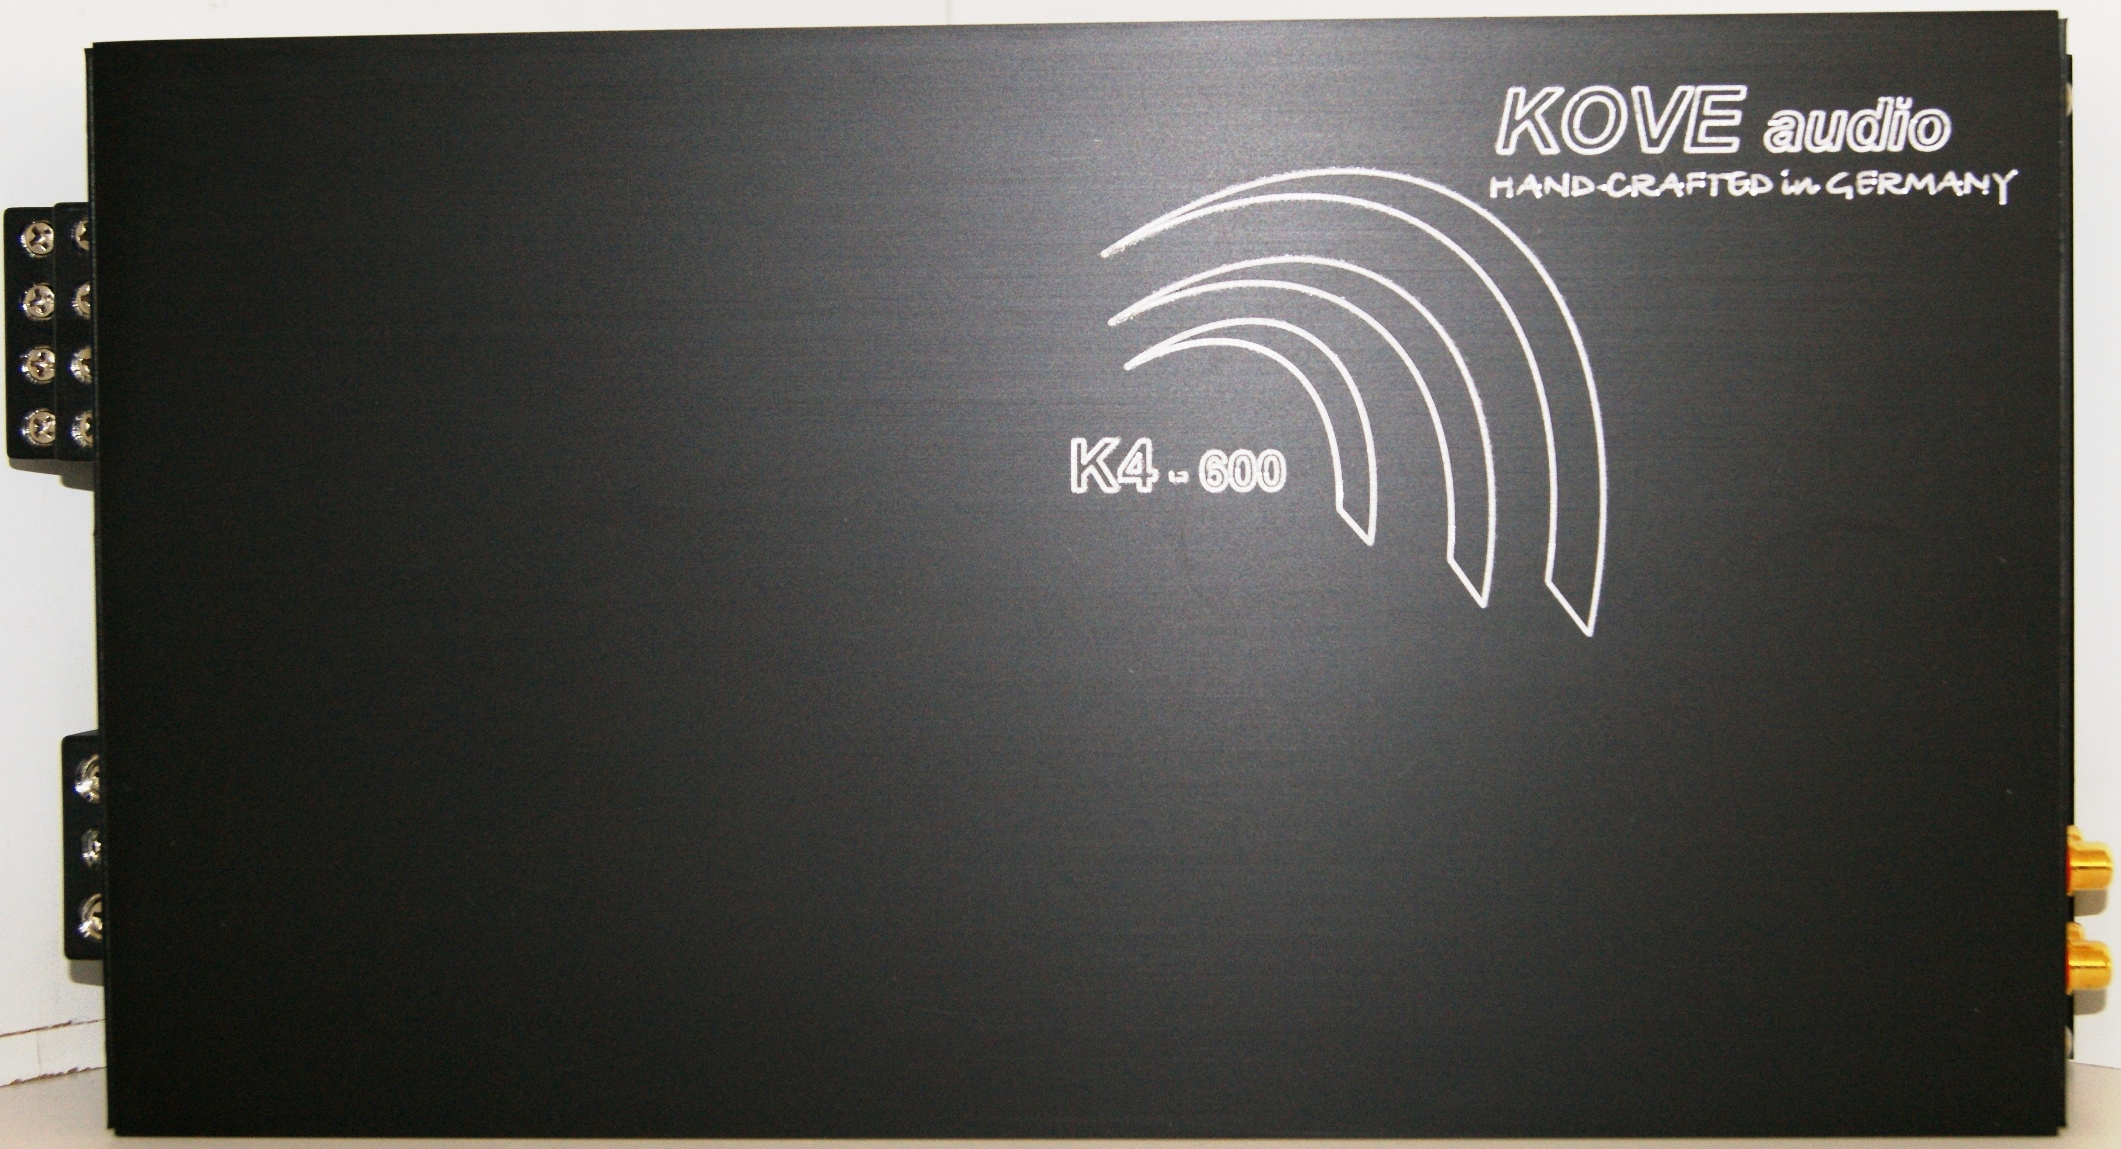 K4 400